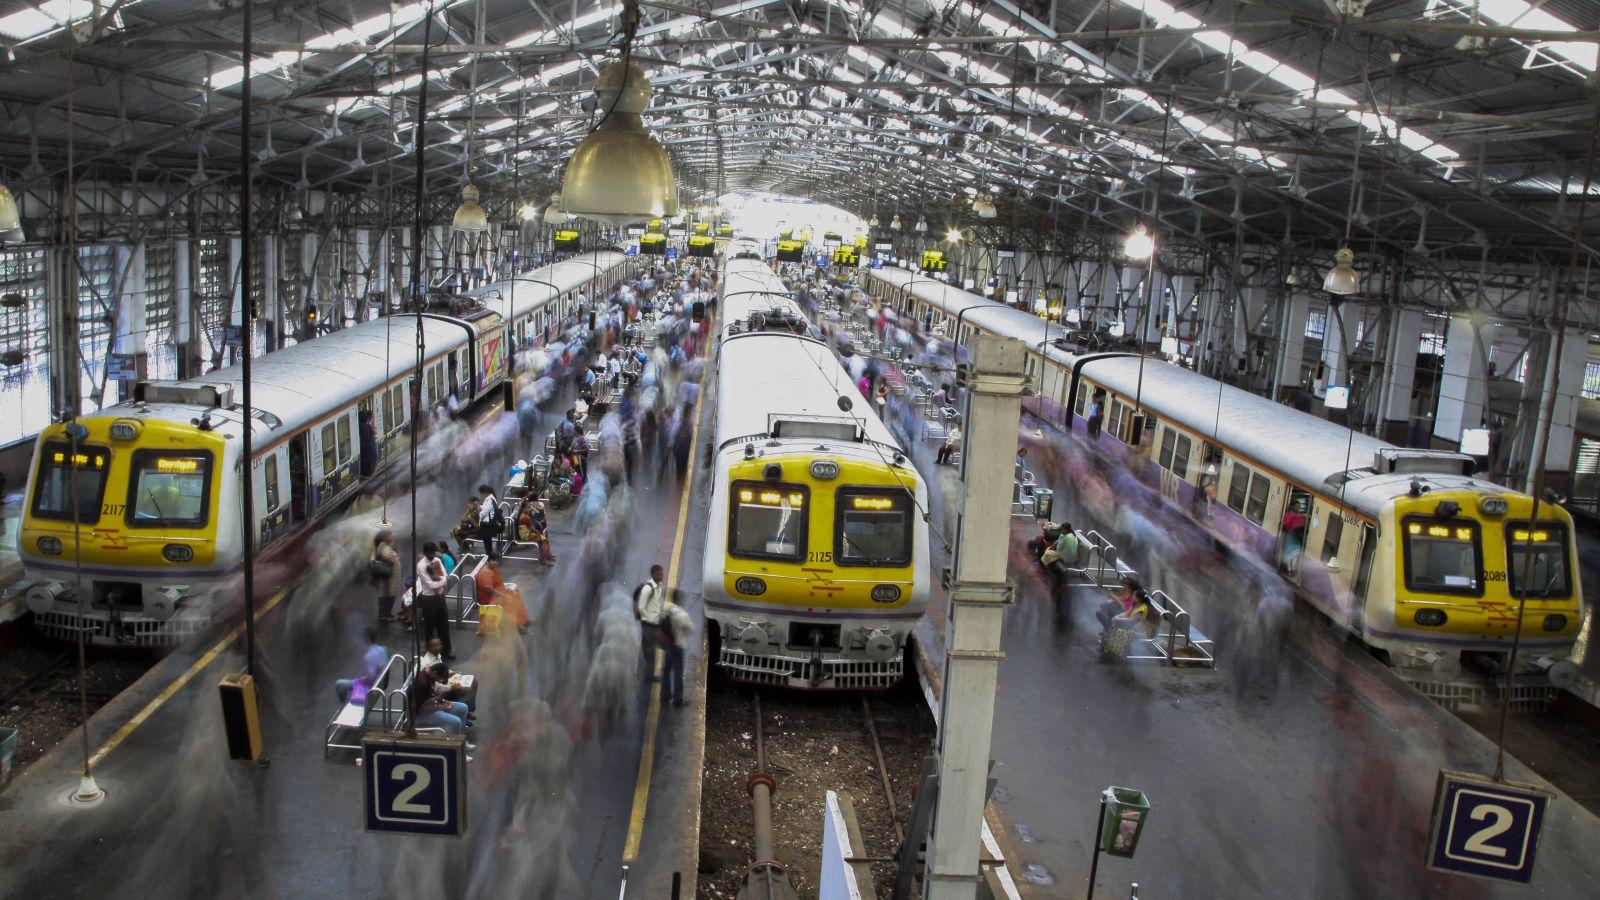 Braving Mumbai's local trains during monsoon peak hours